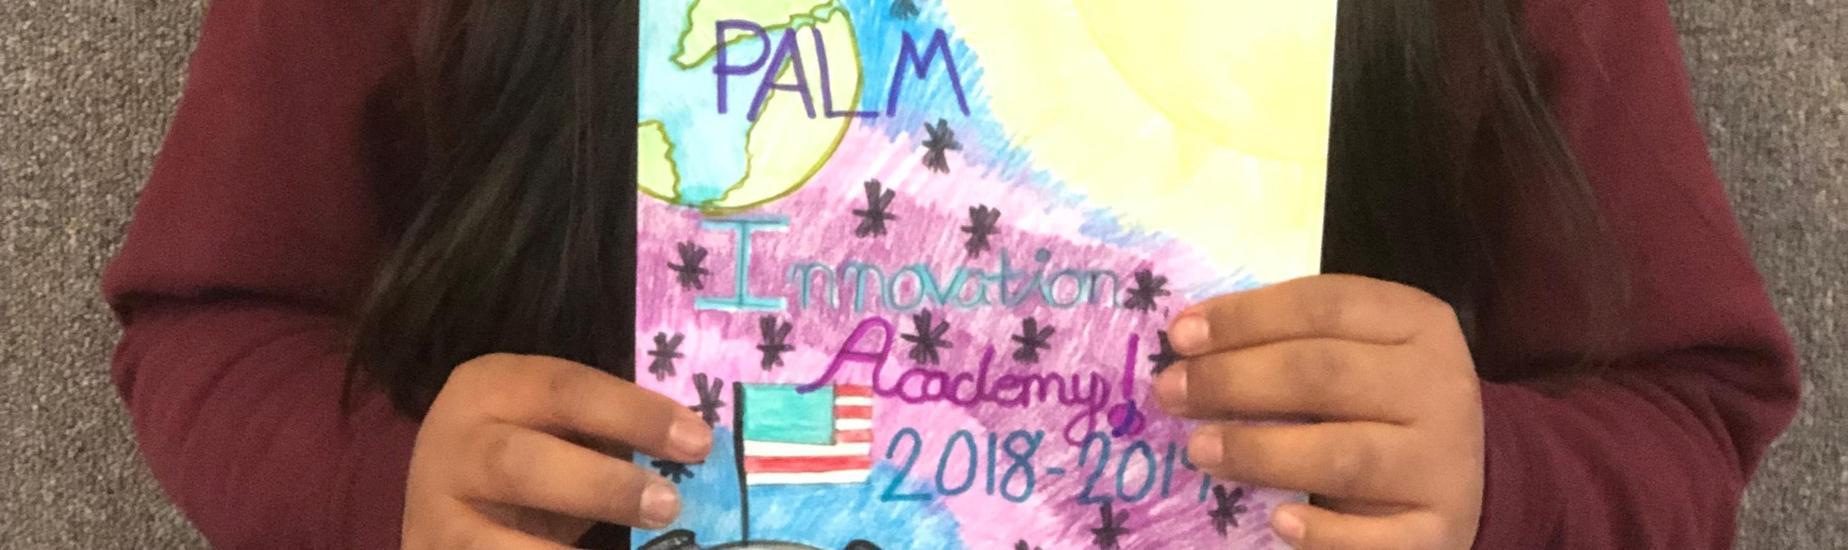 Palm Innovation Academy